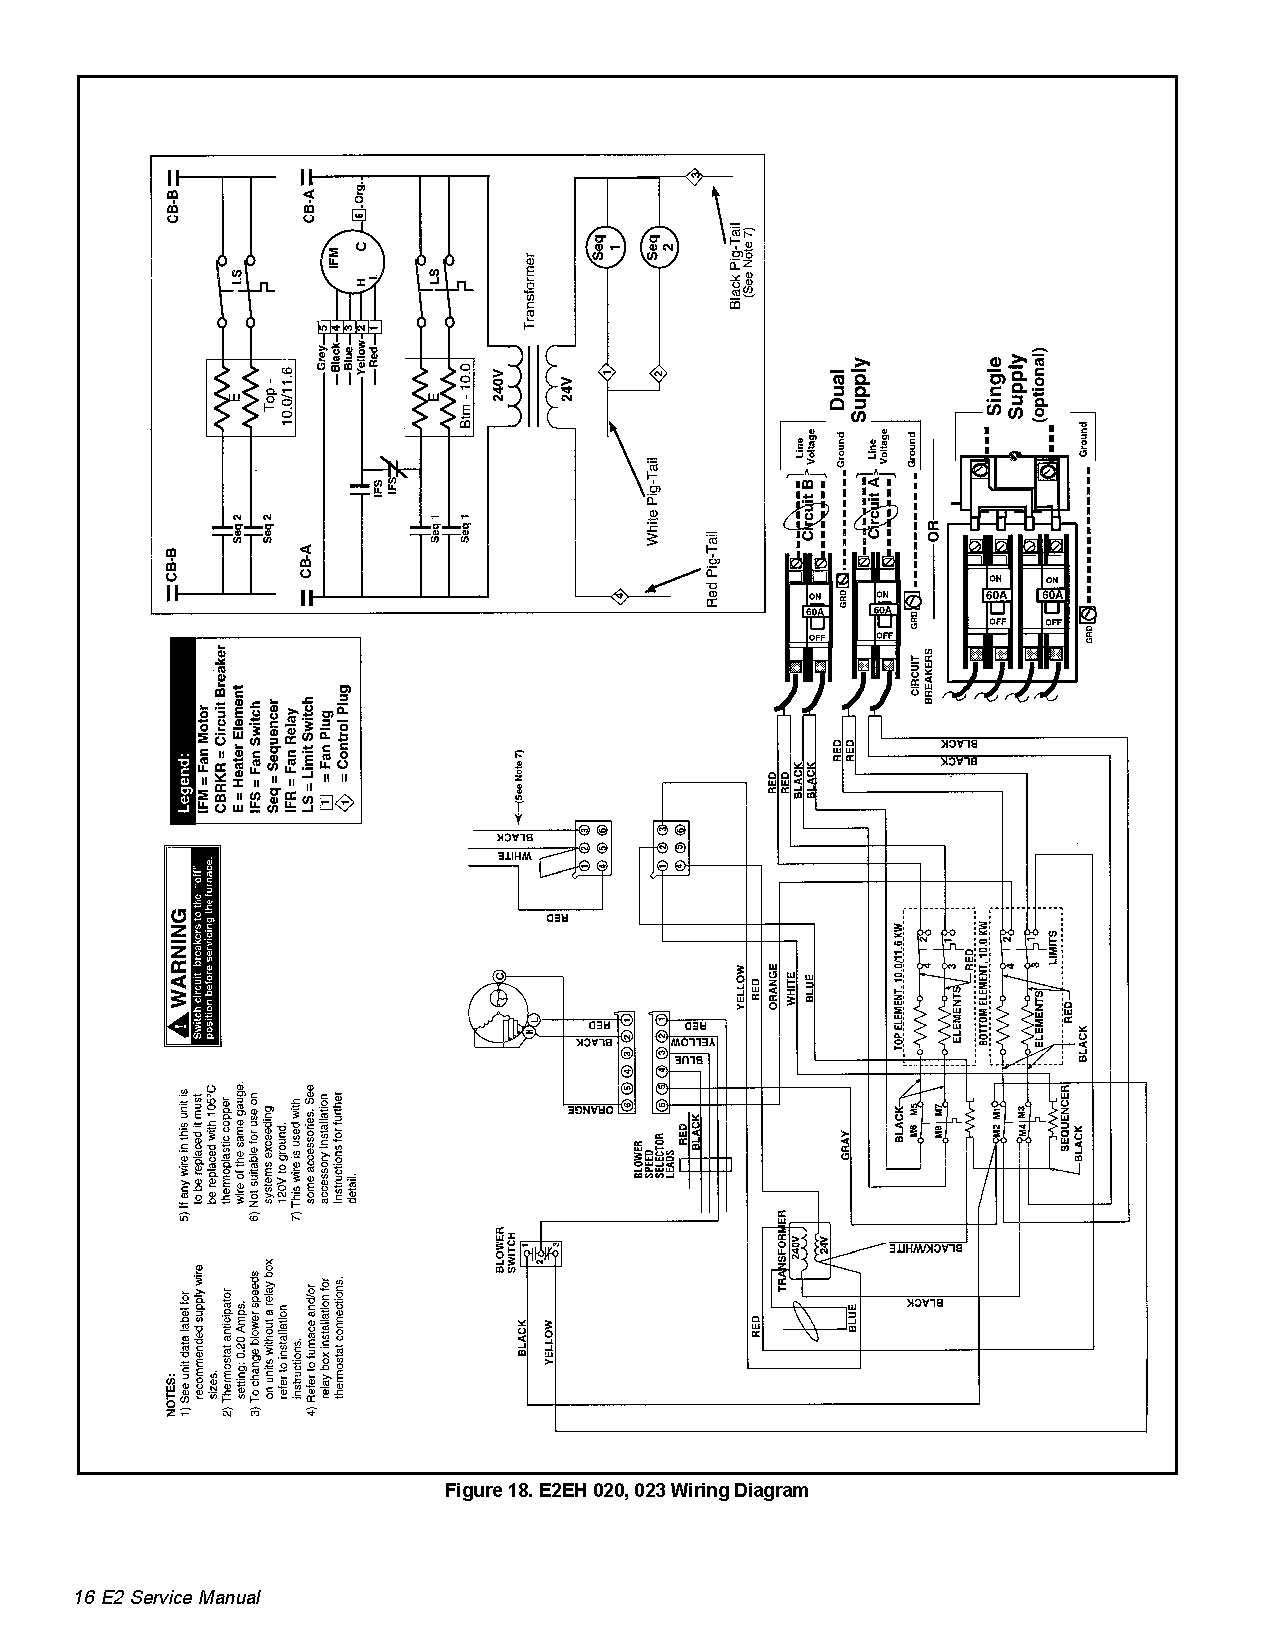 Nordyne Thermostat Wiring Diagram